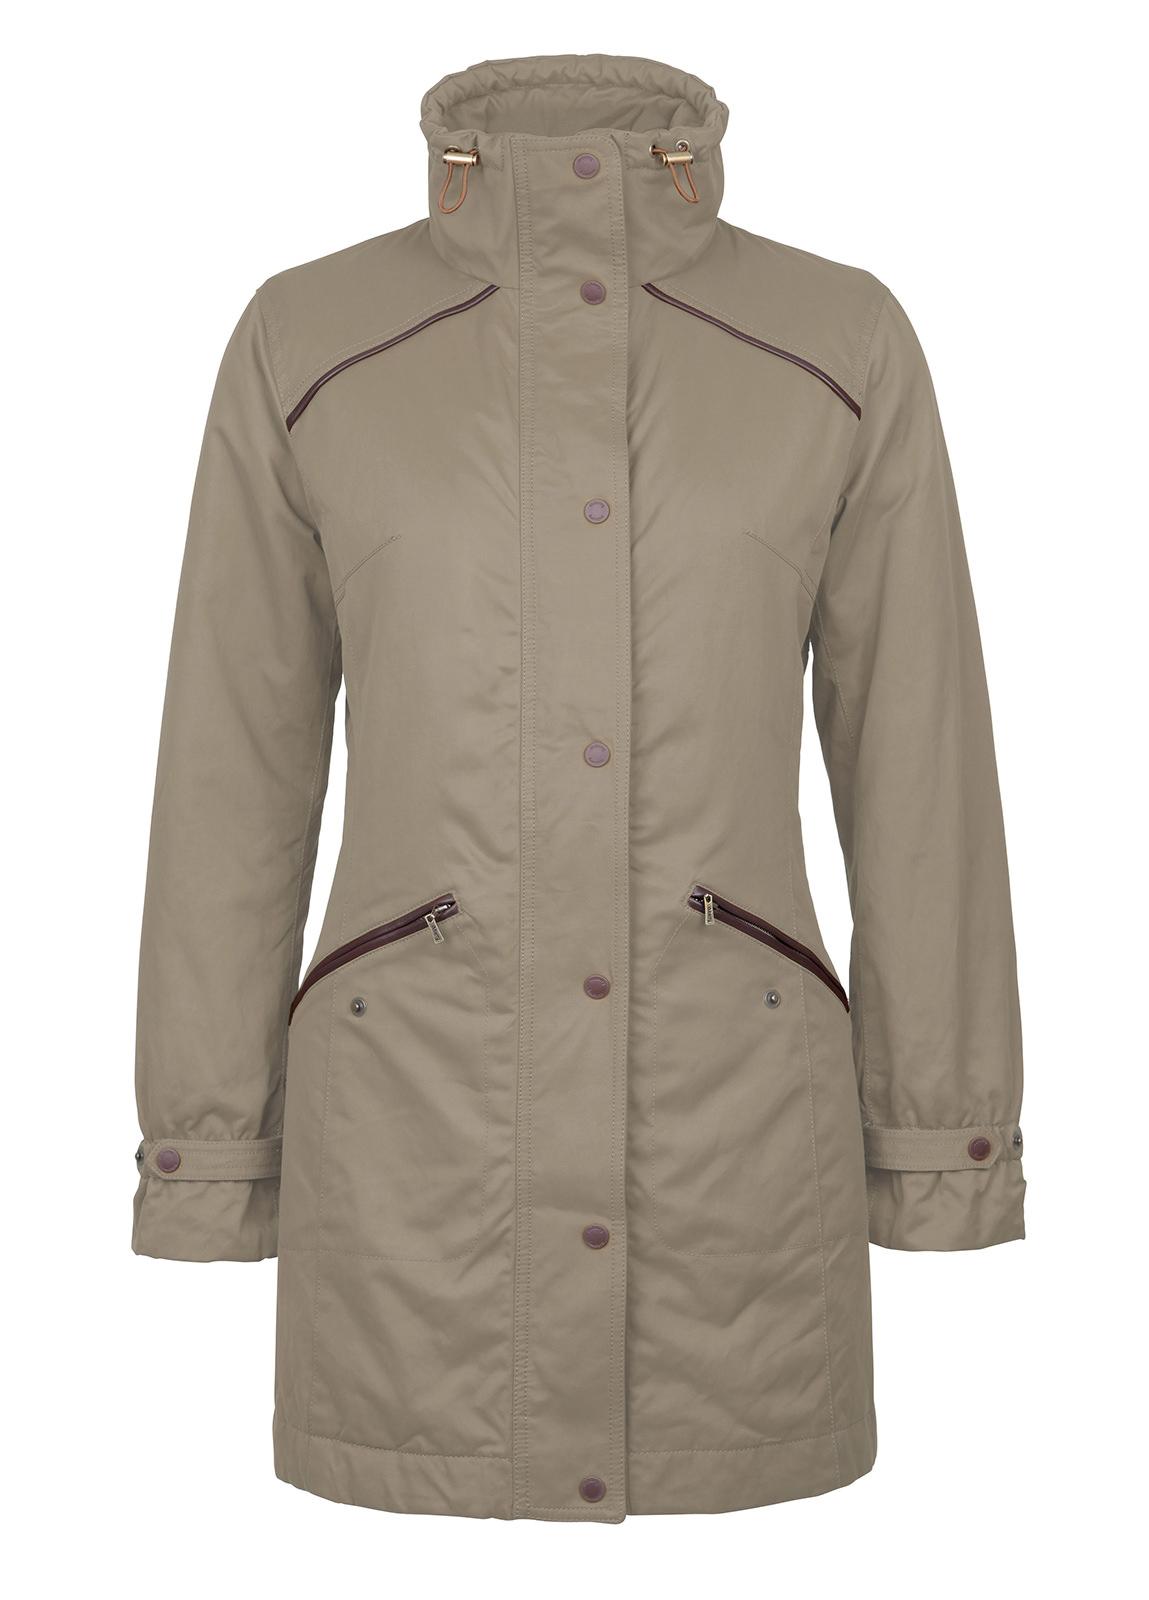 Dubarry_Leonard Womens Waterproof Coat - Ruby Red_Image_2